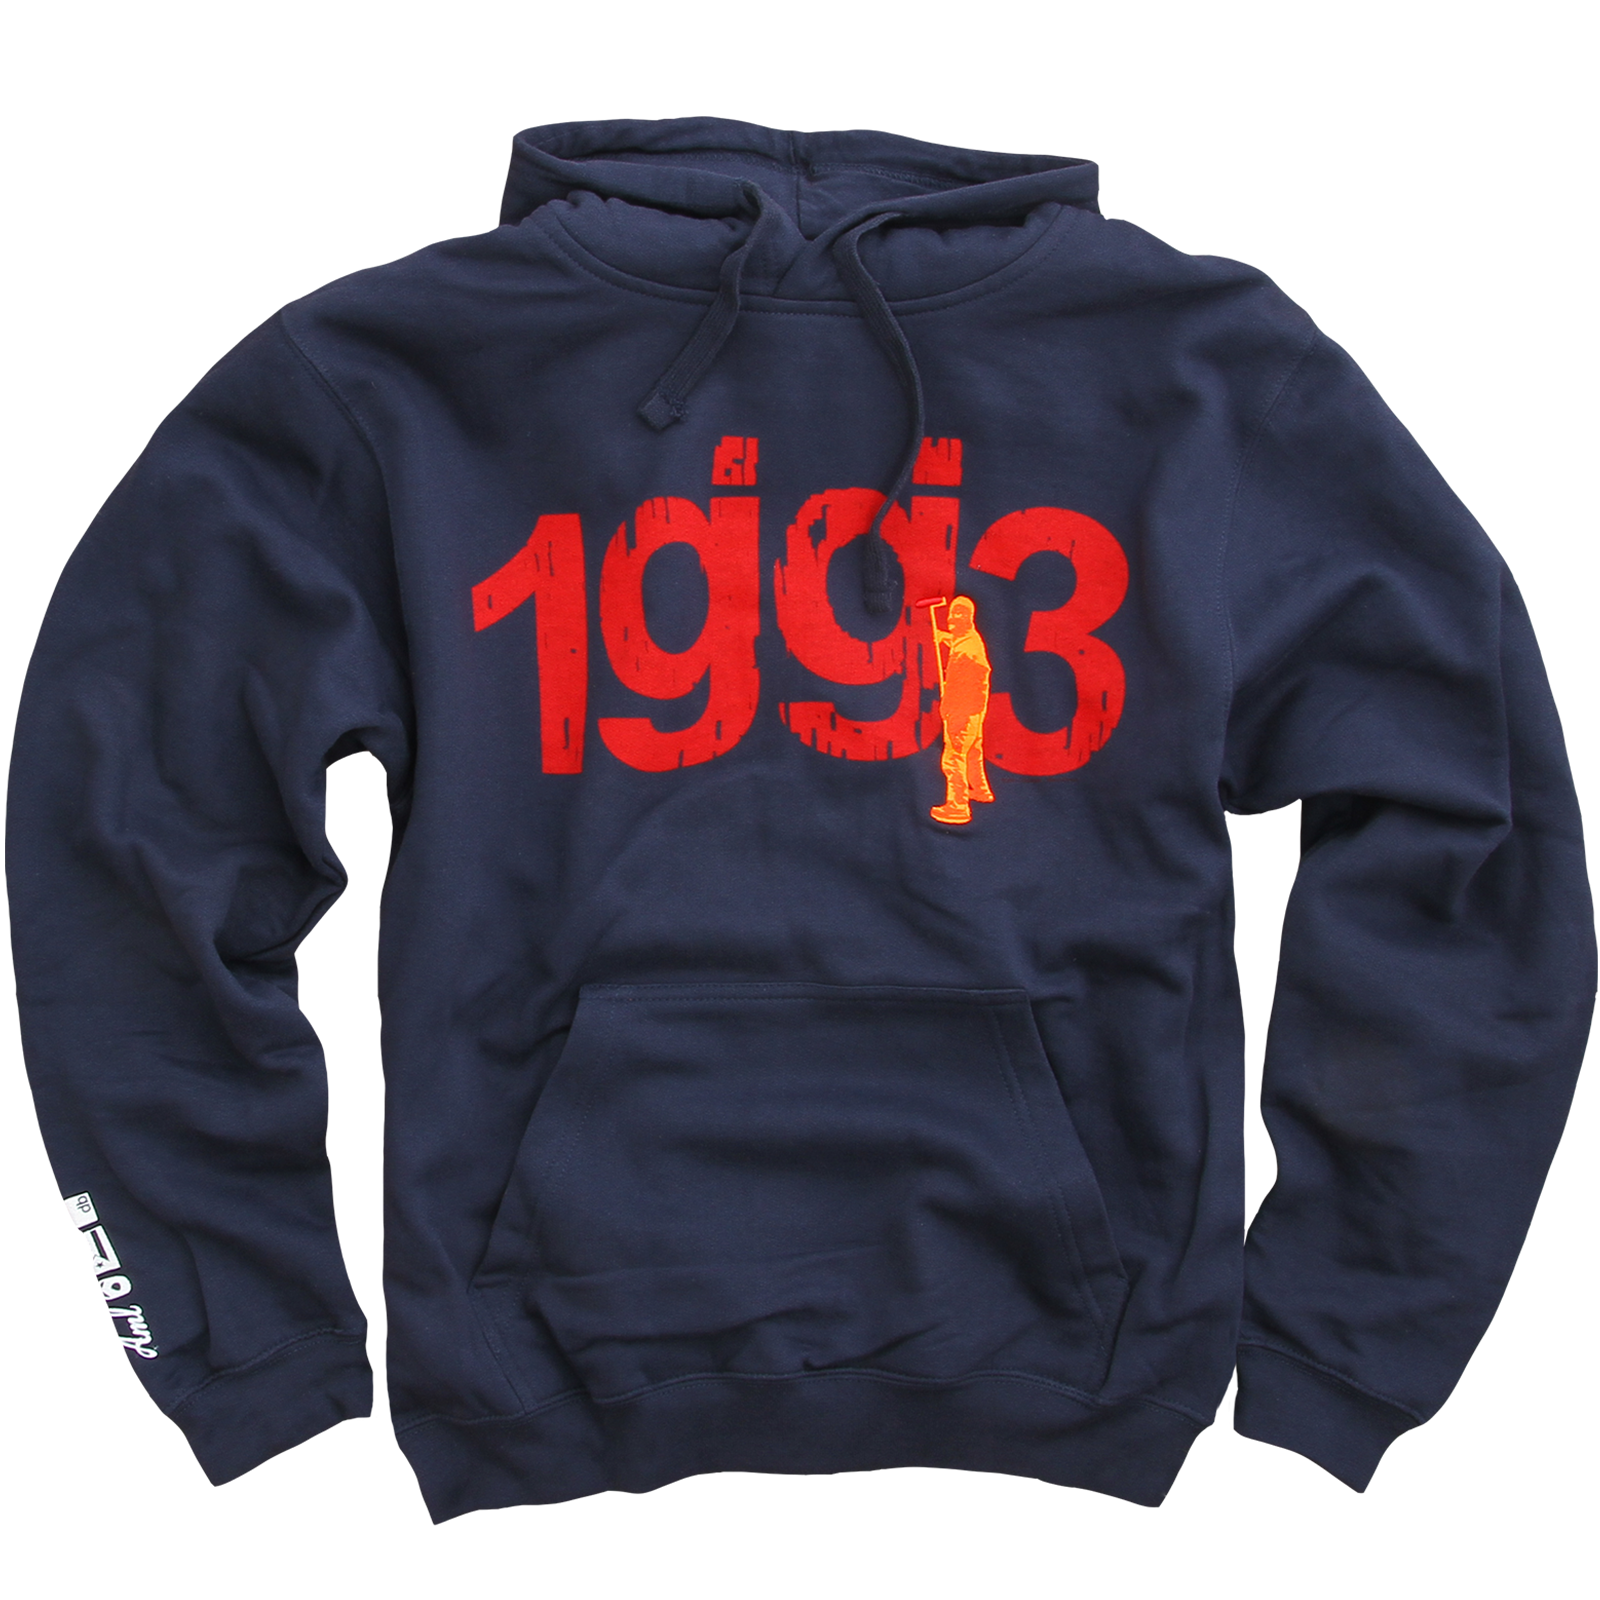 1993 Rollerman